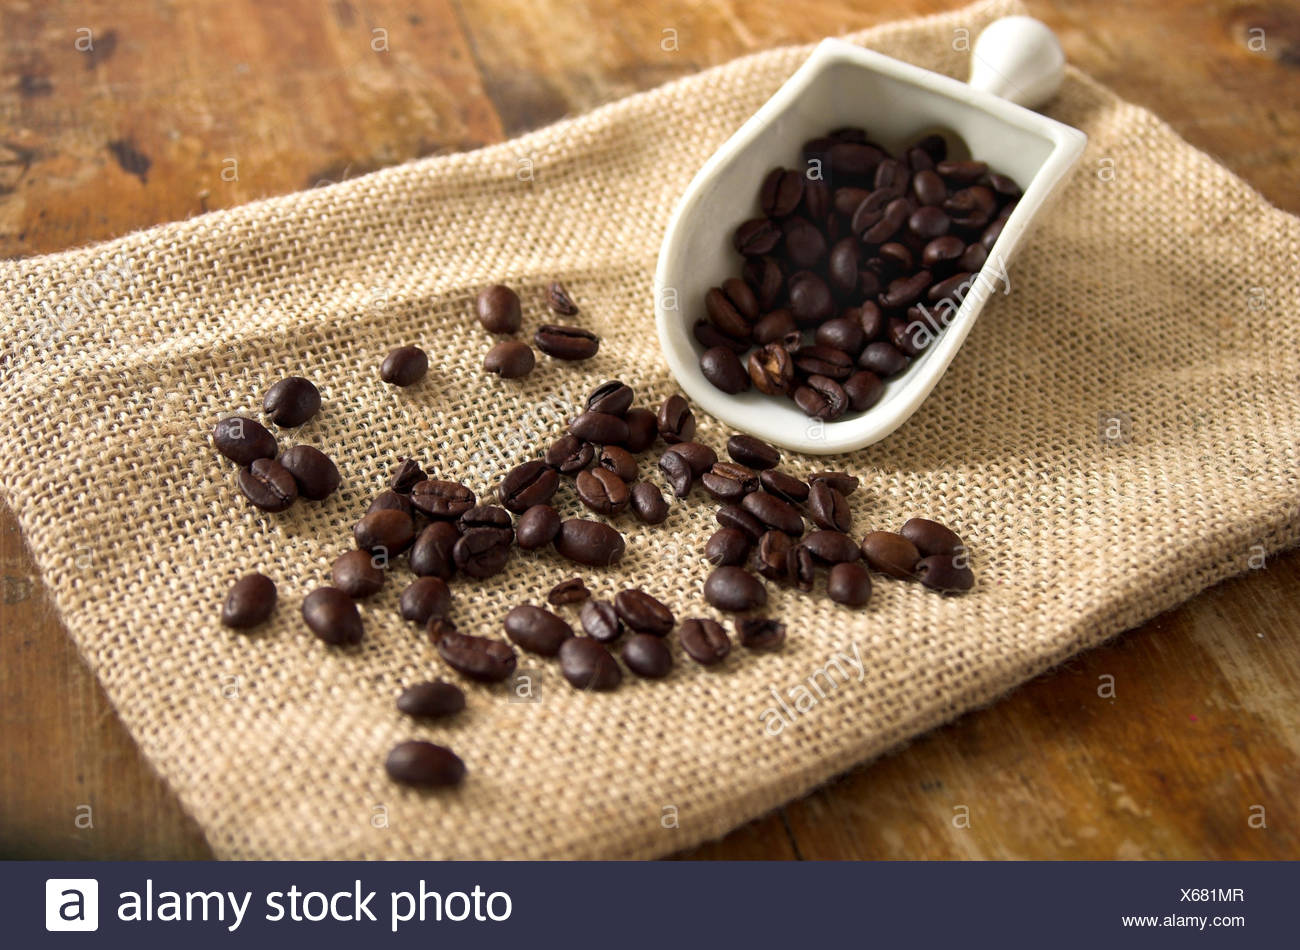 Coffee beans, jute bags, shovel, - Stock Image